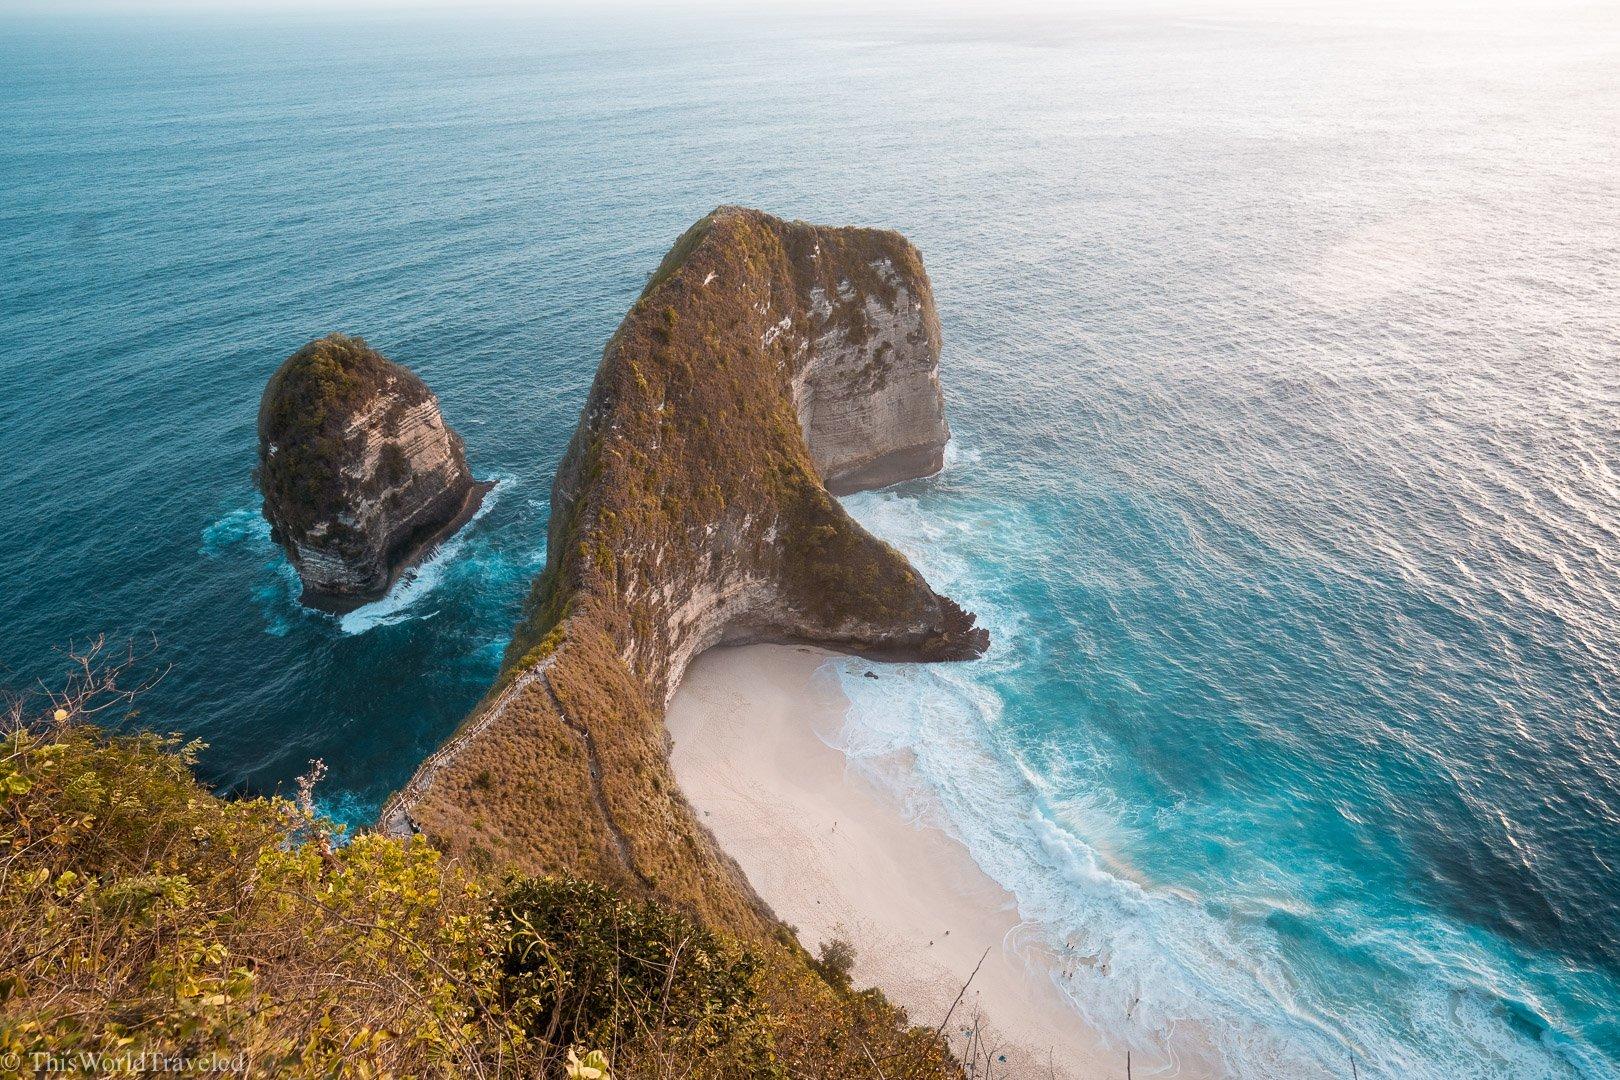 The T-Rex shaped beach on Nusa Penida